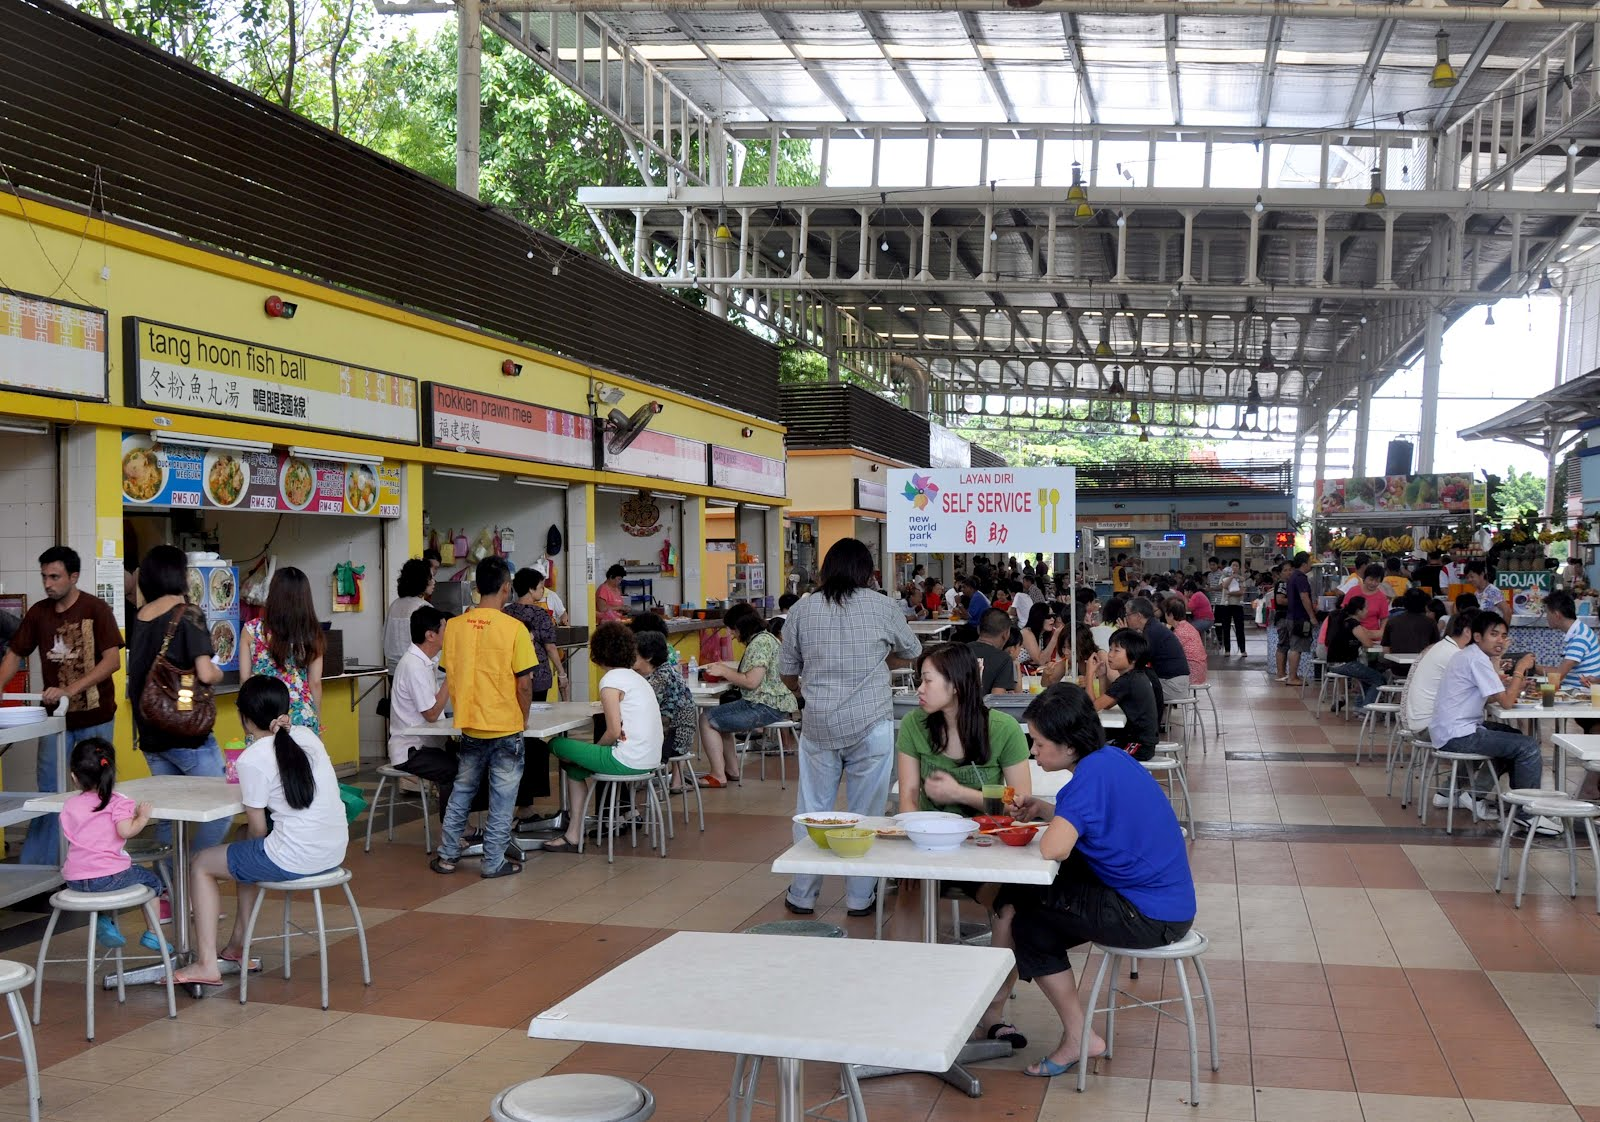 Penang 2011 - New World Park Food Court